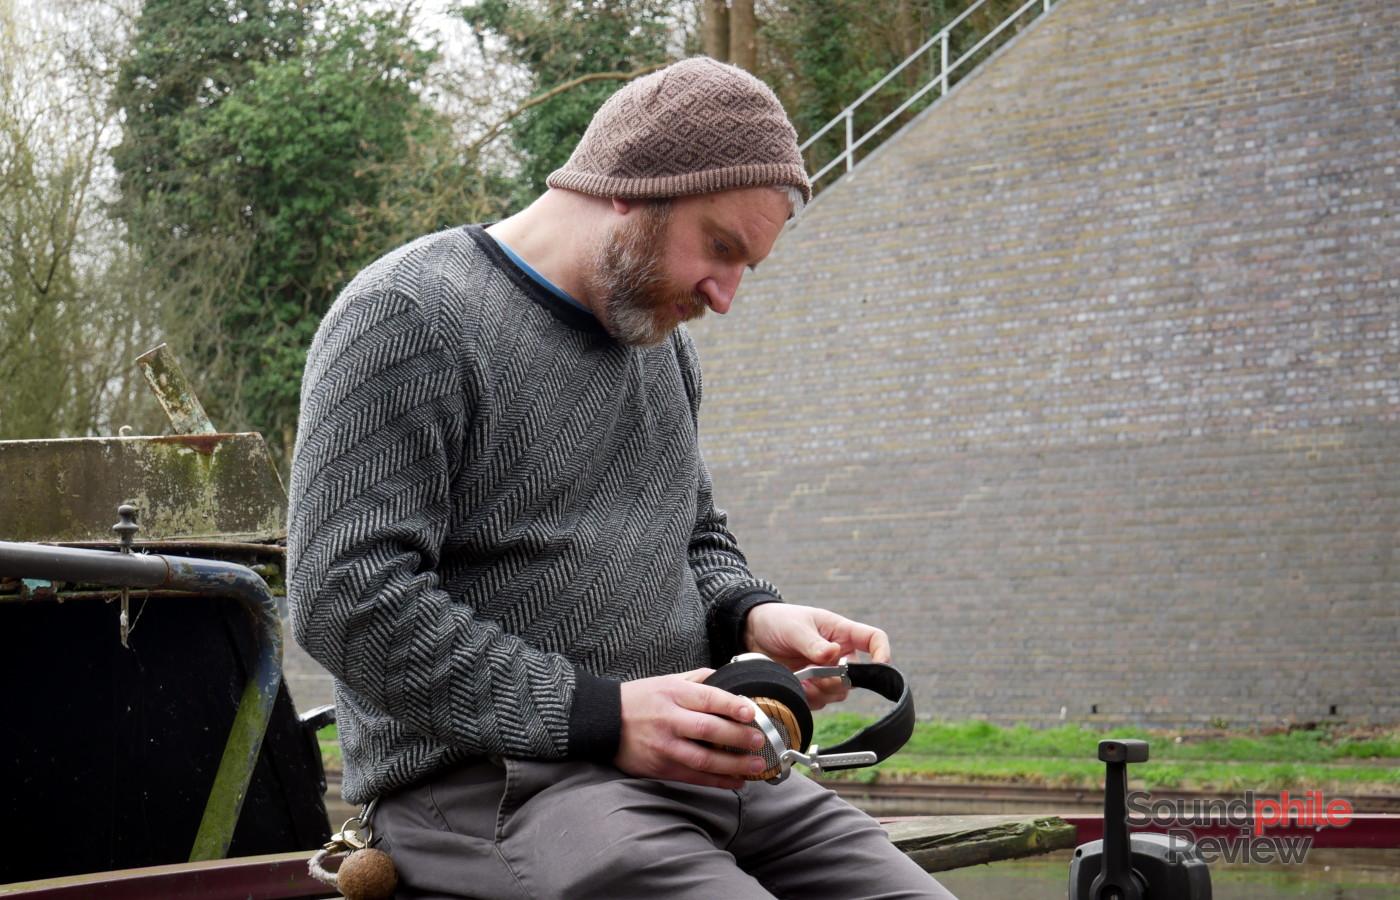 Interview with Alex Hyland of Hyland Headphones